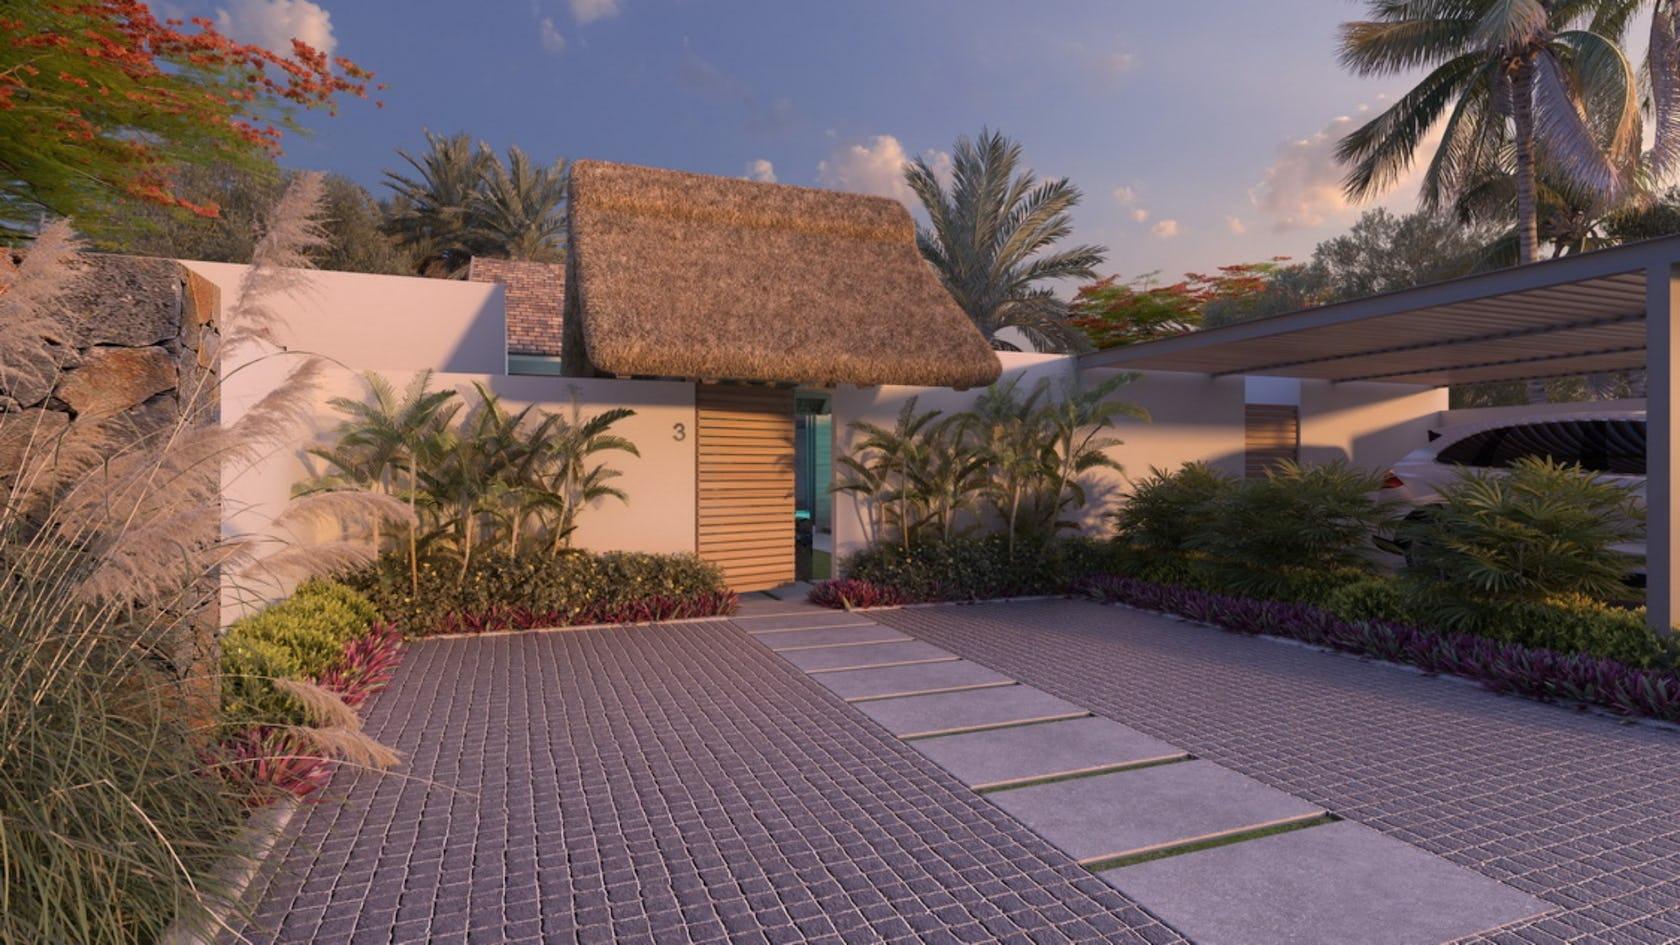 walkway path flagstone bush plant vegetation building outdoors tree